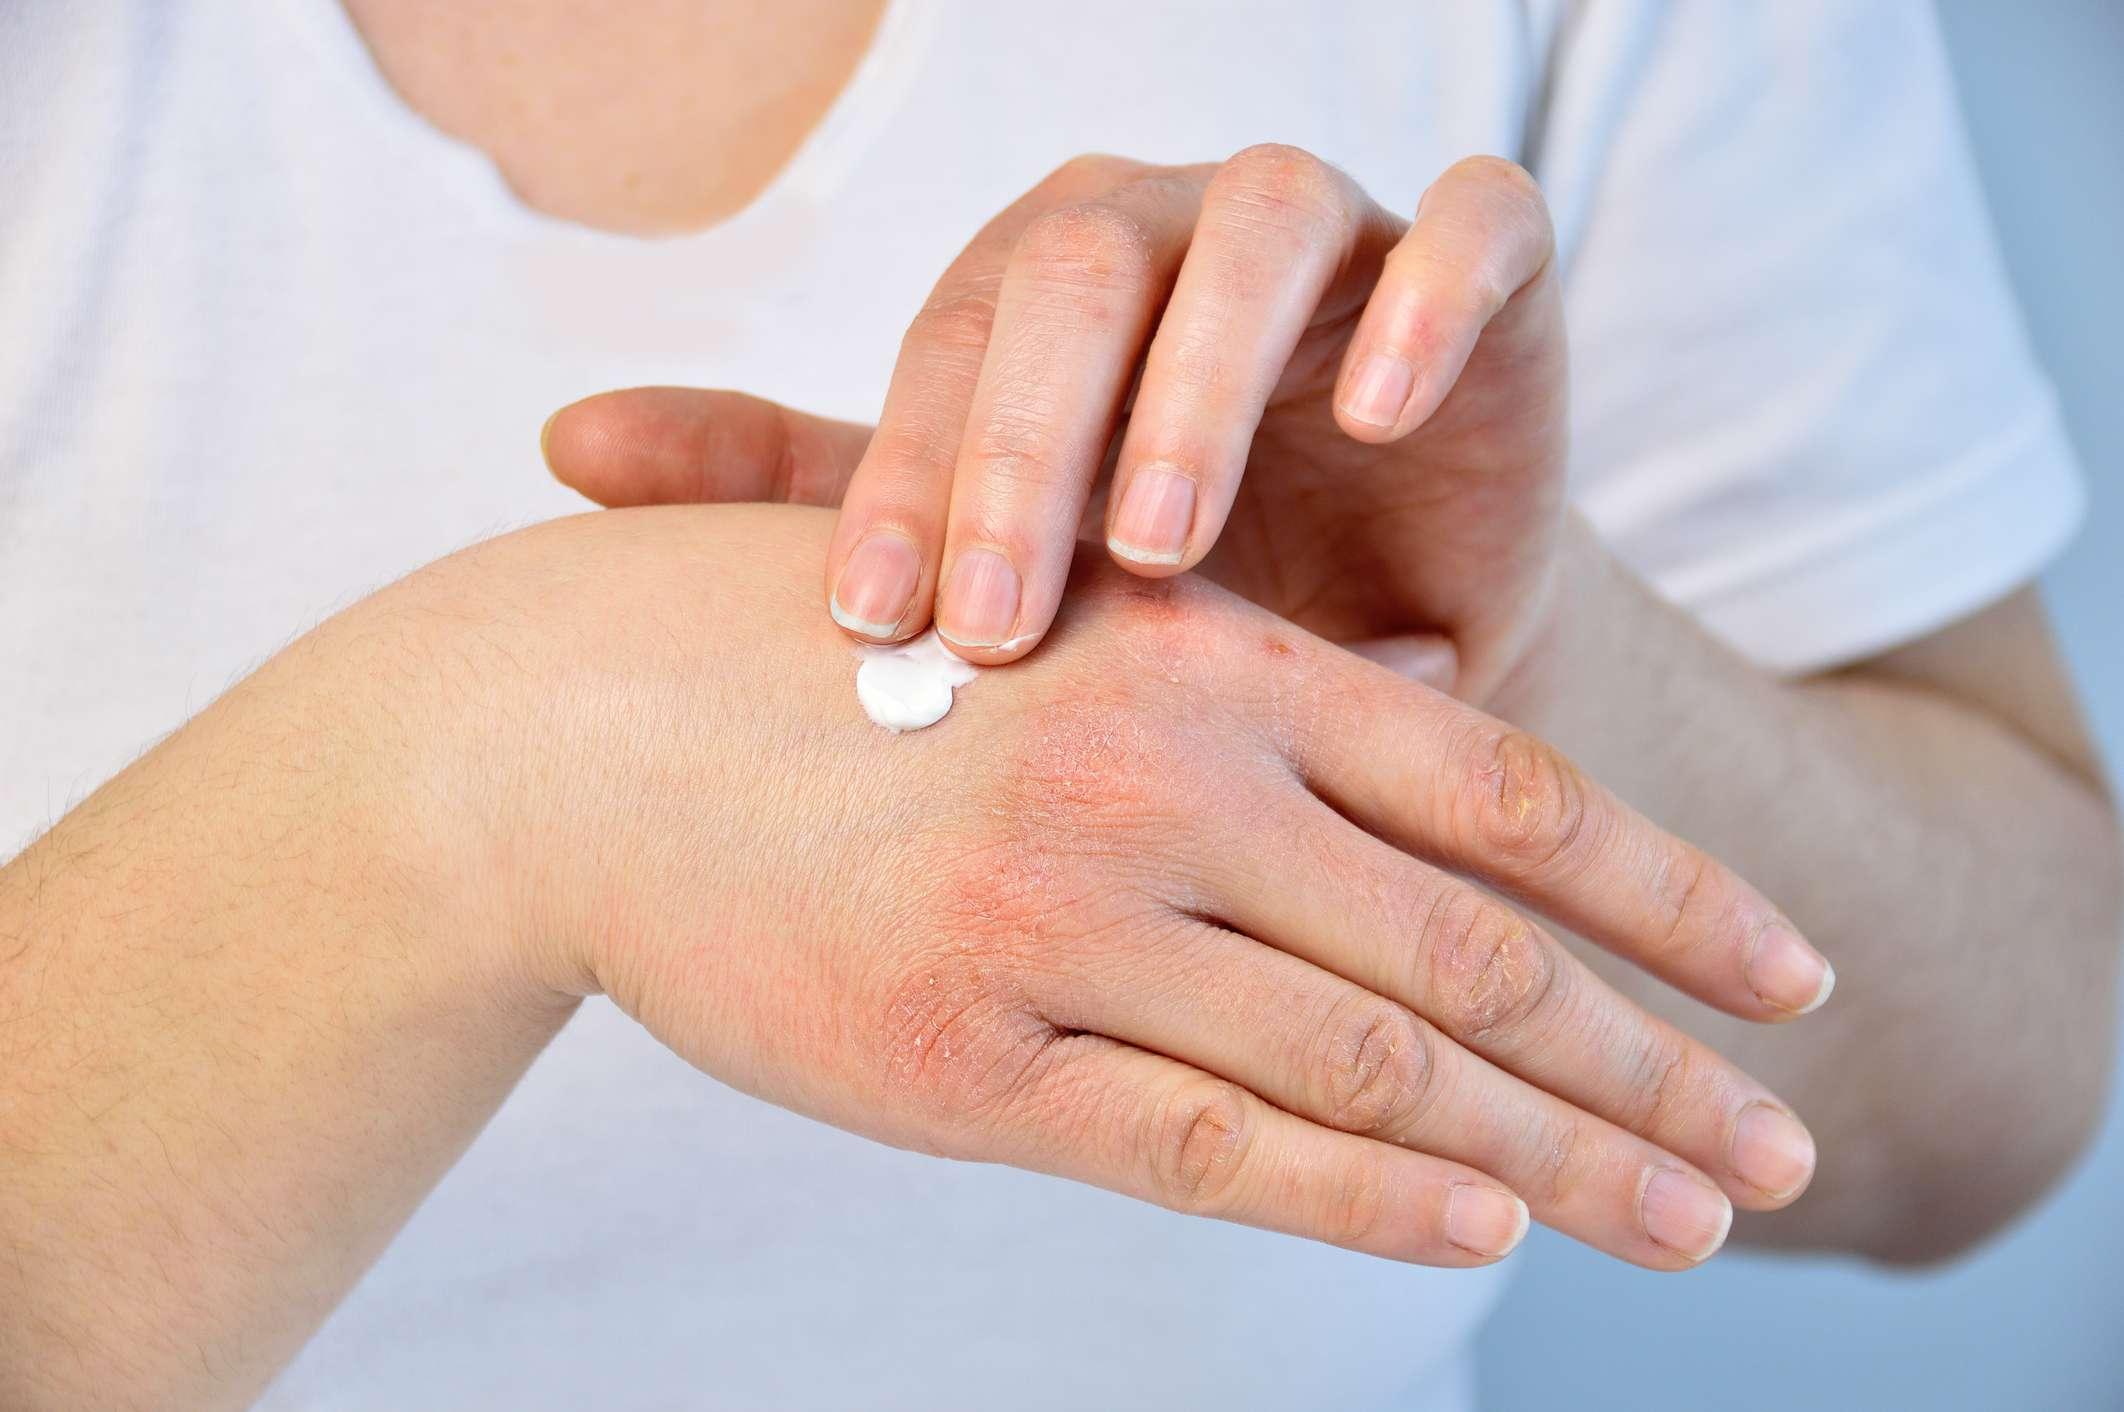 best cream for psoriasis on hands)